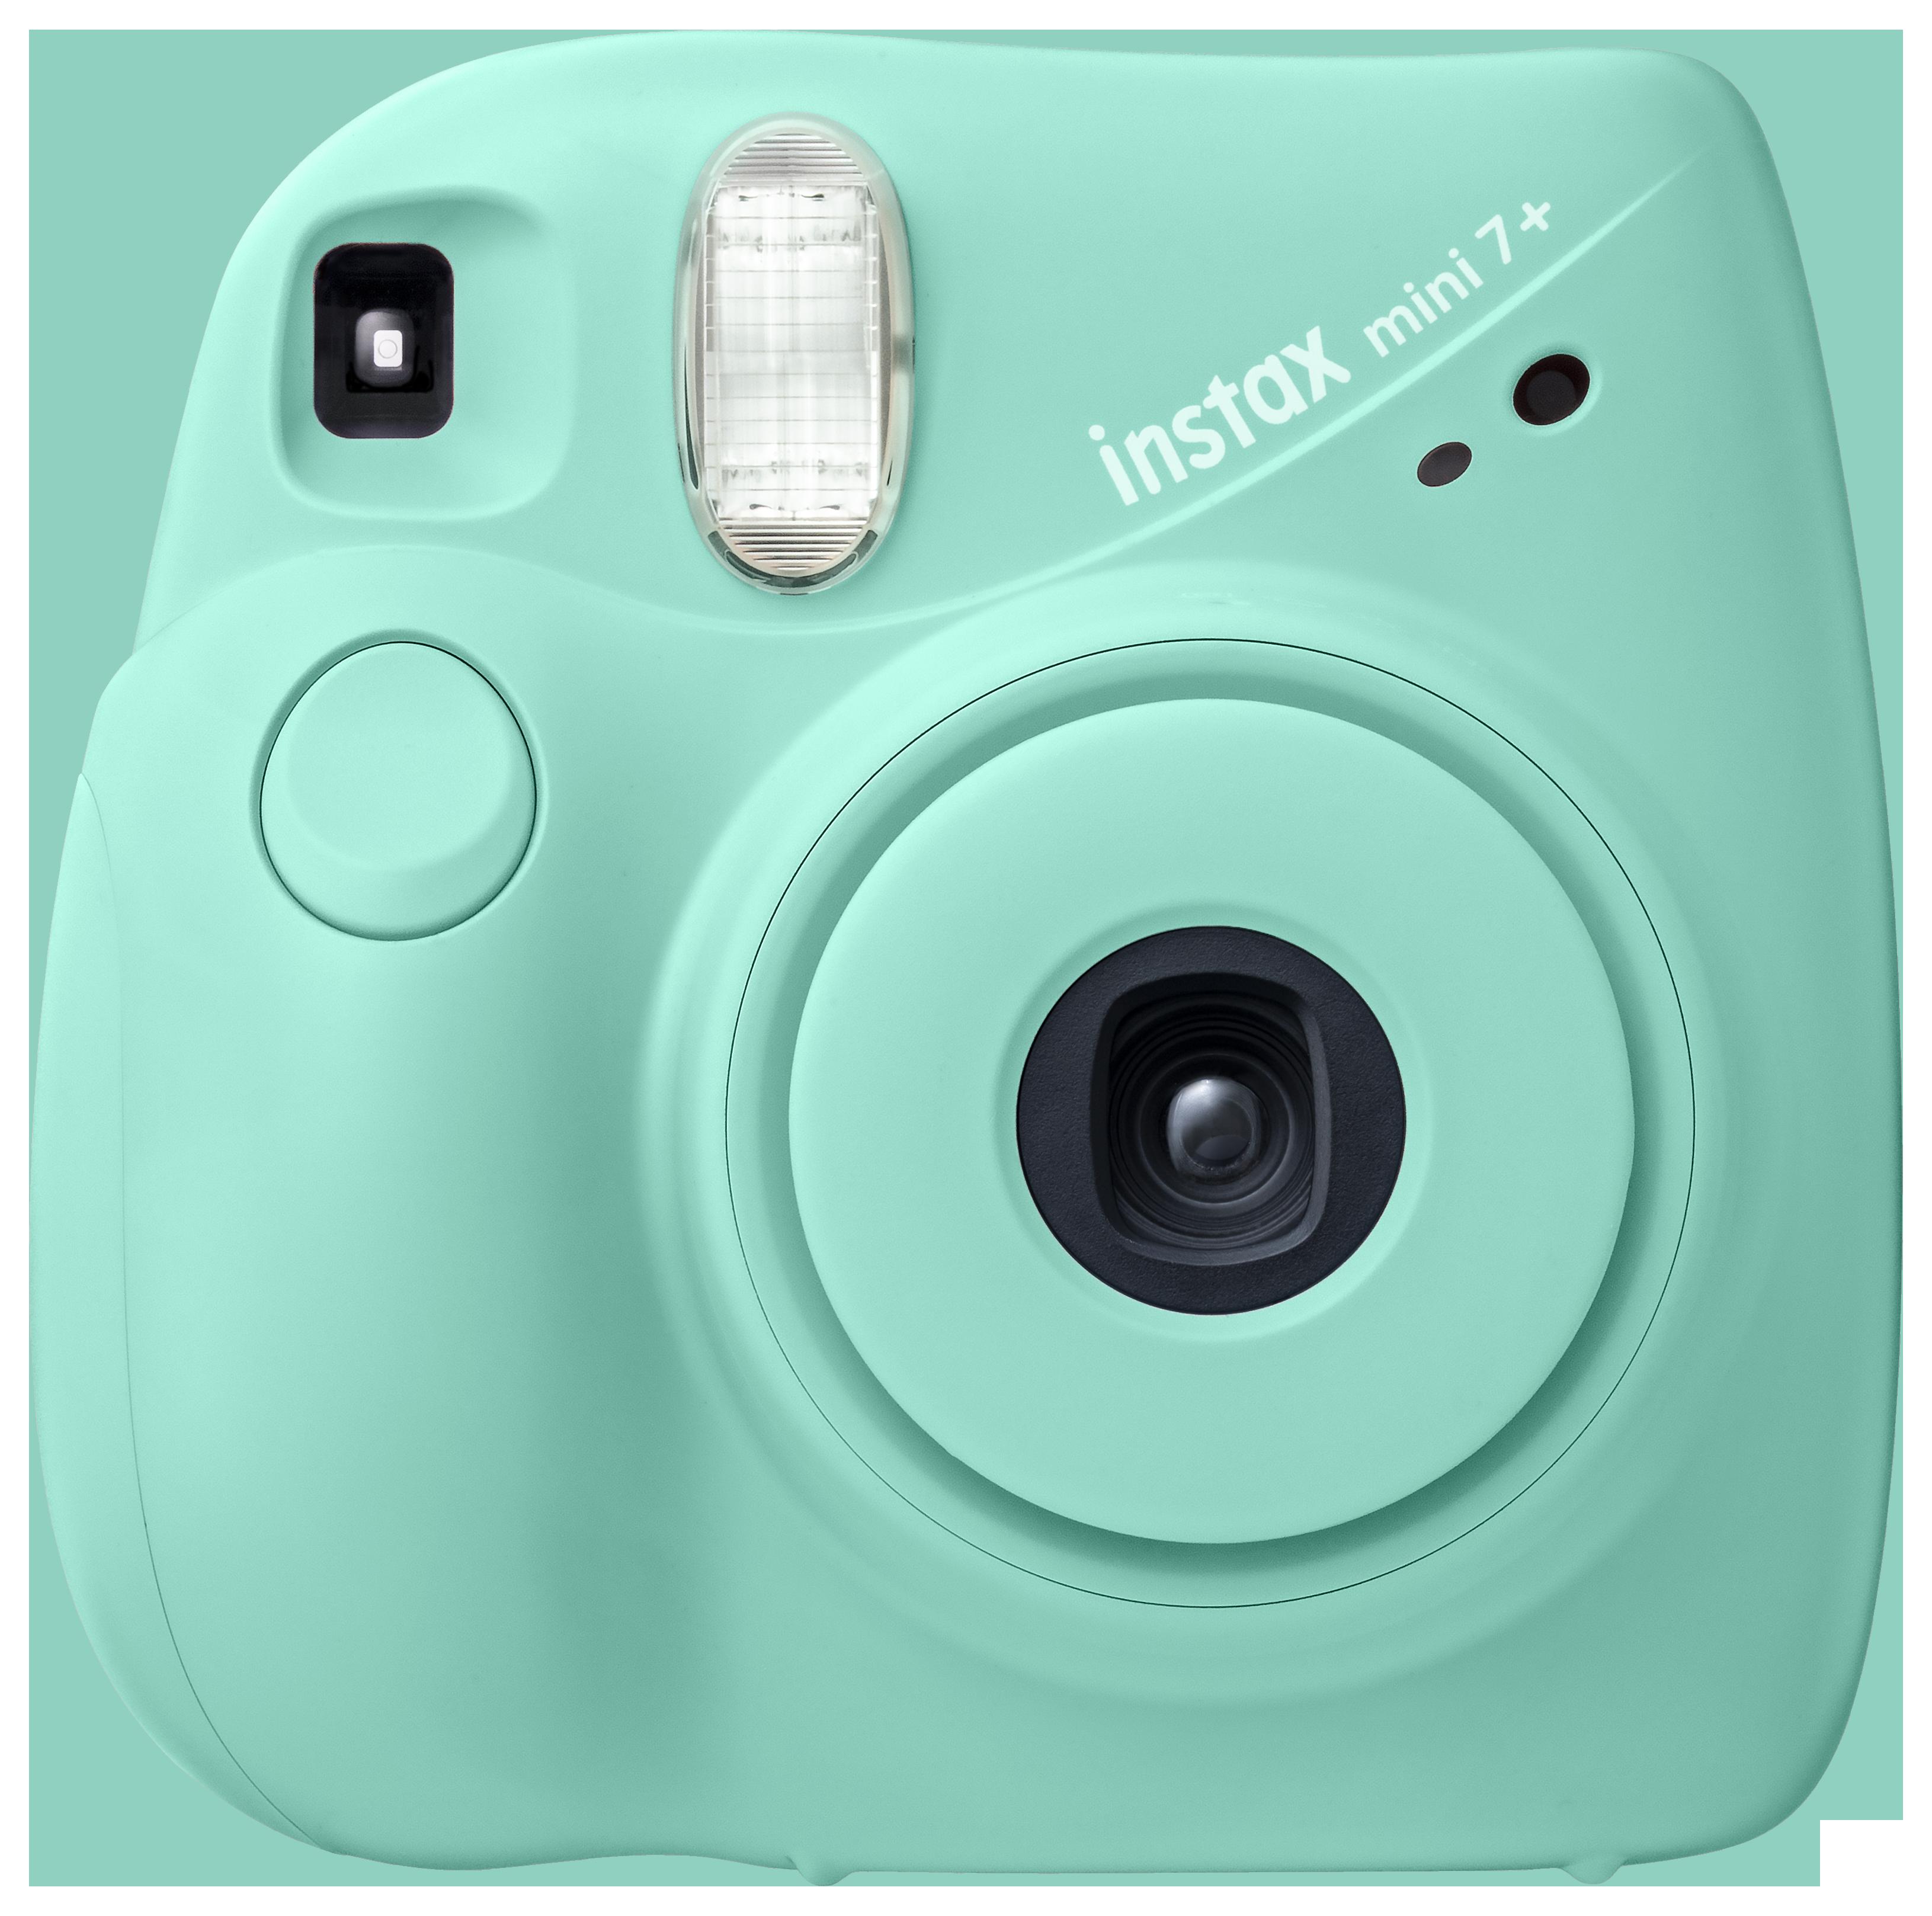 Mini 7S cameras in mint